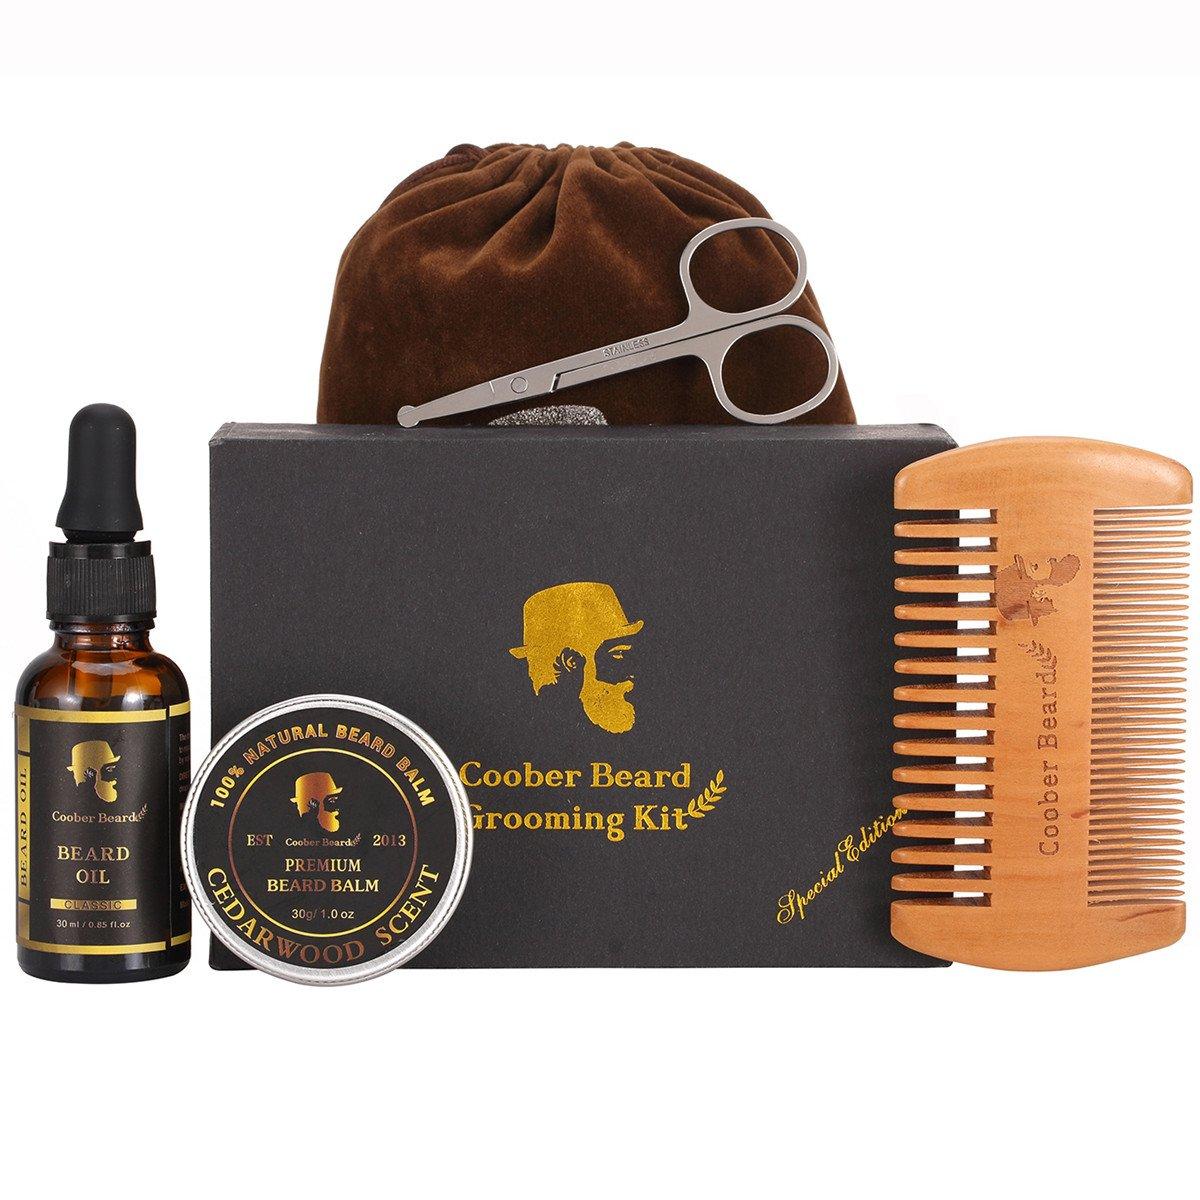 KEYNEW Men Beard Care Grooming & Trimming Kit 30ml Woody Scent Beard Oil, 30g Mustache & Beard Balm Wax, Wooden Beard Comb, Solid Barber Scissors, Storage Pouch, Gift Box for Bearded Men, Travel Essential Set